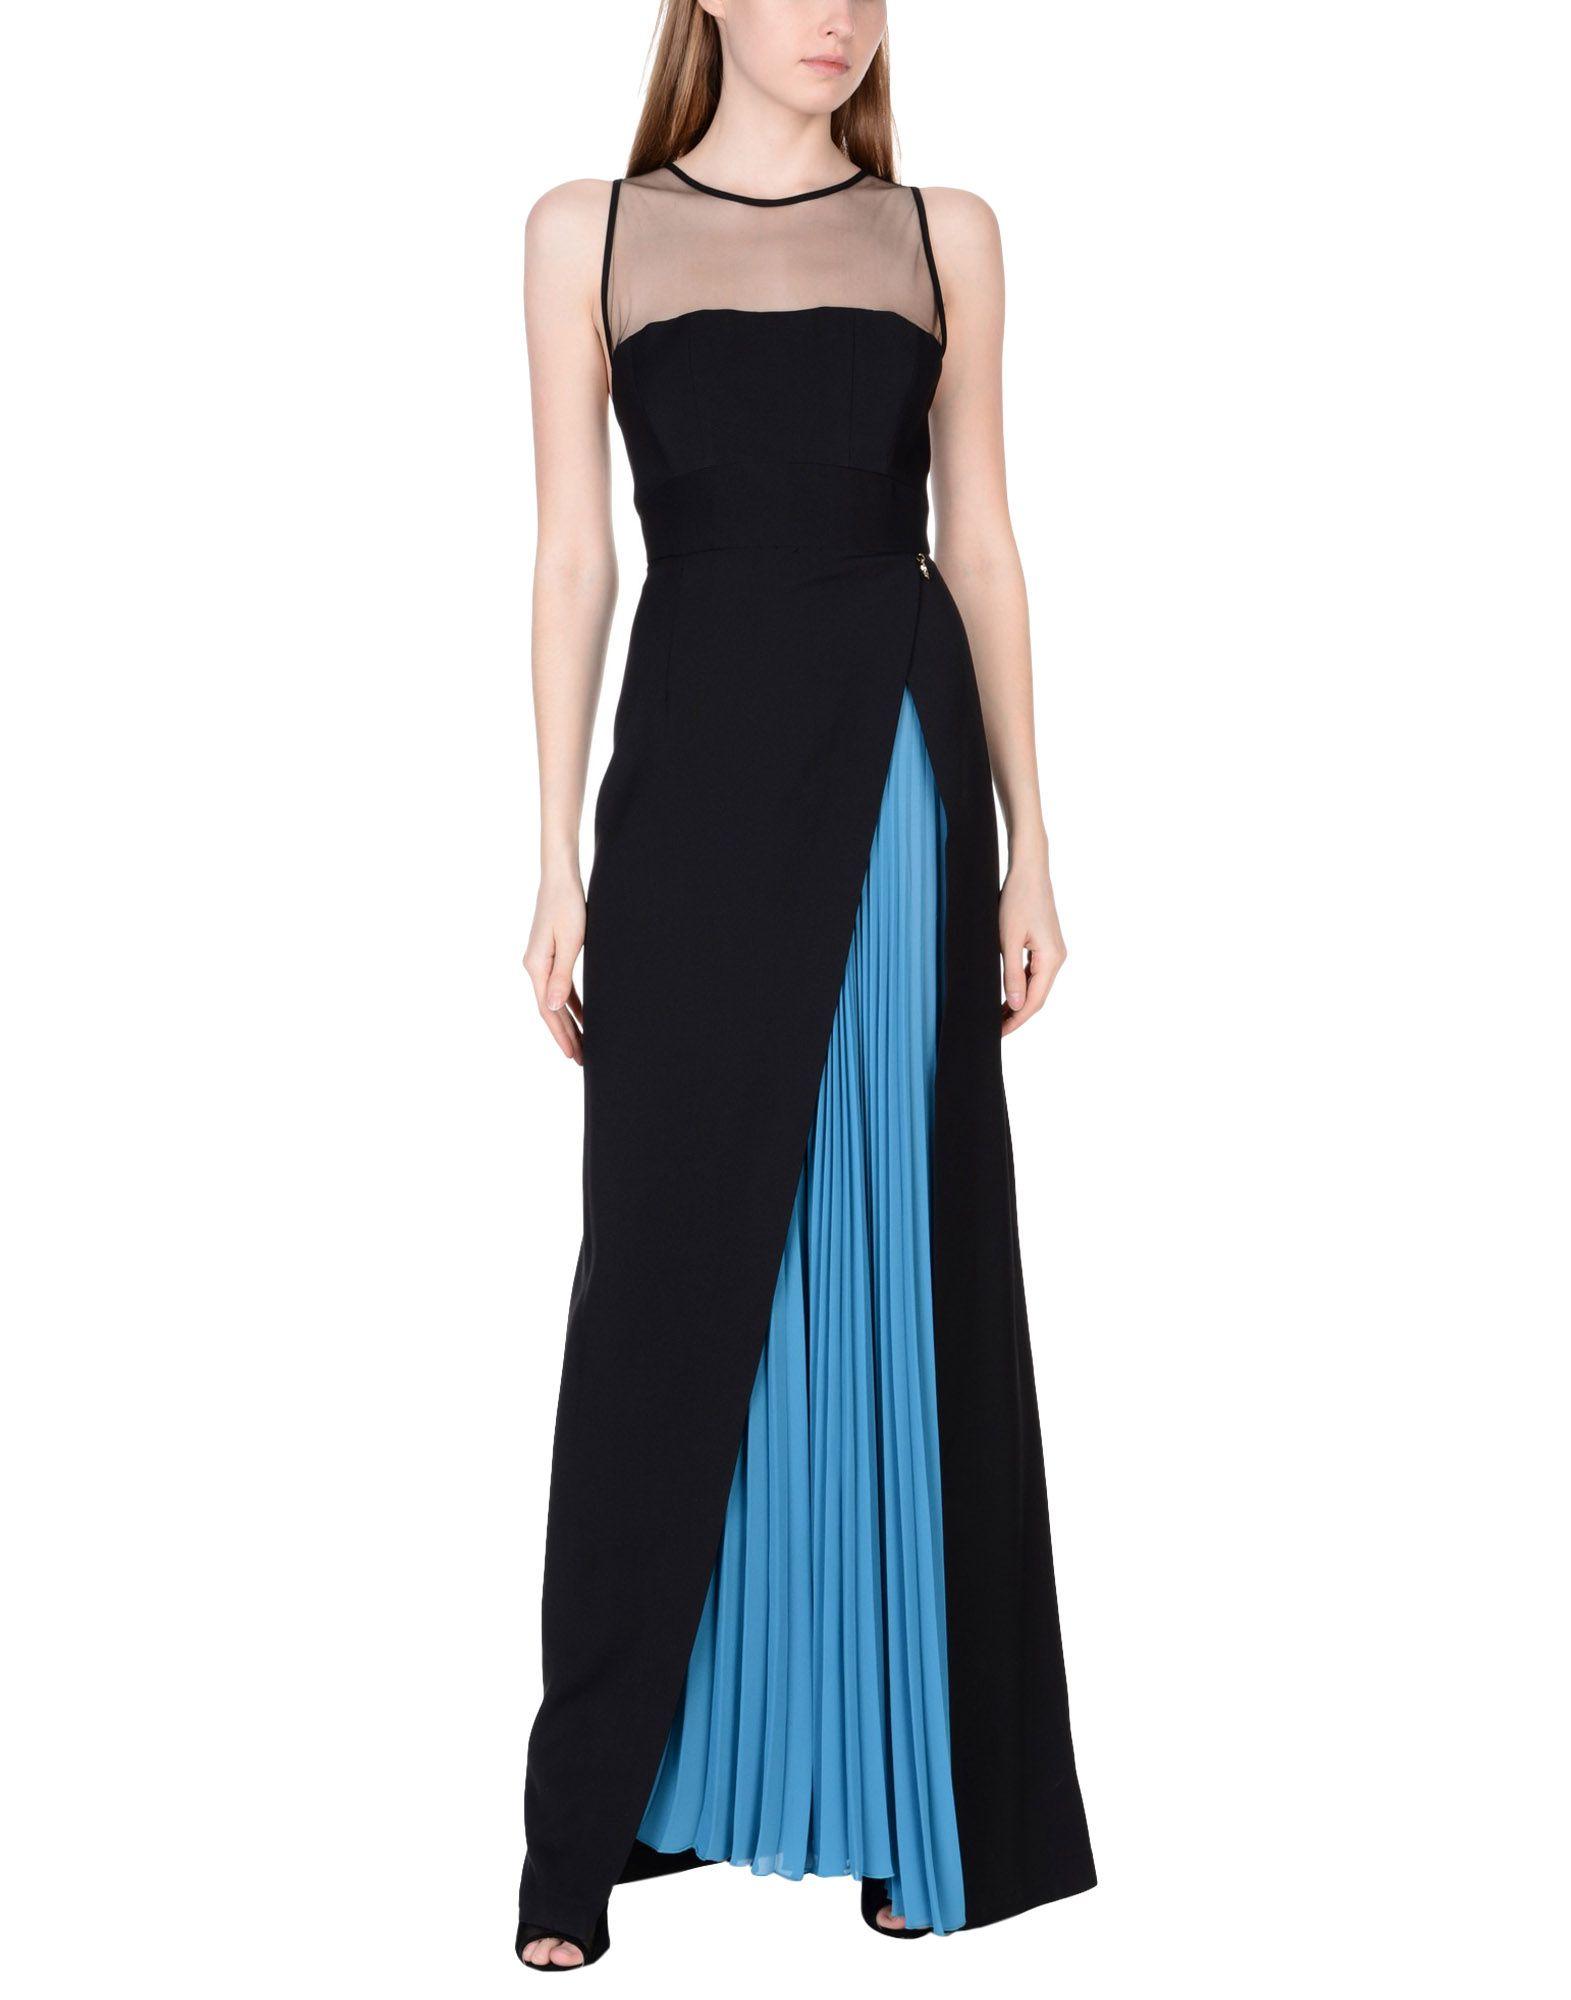 MANGANO Long Dress in Black